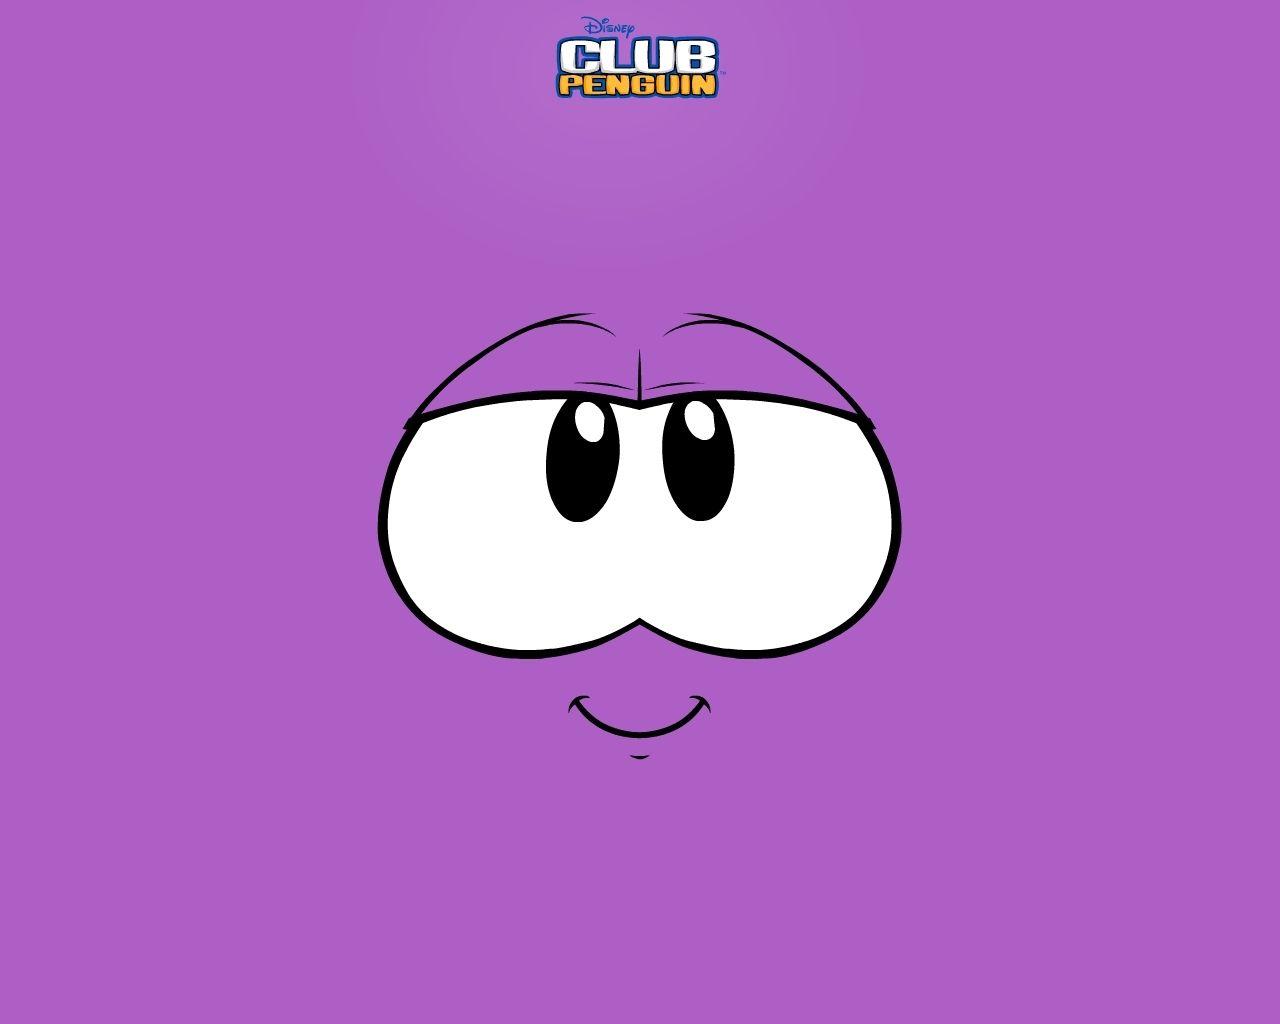 New Club Penguin wallpaper – Purple Puffle Face | Videojuegos